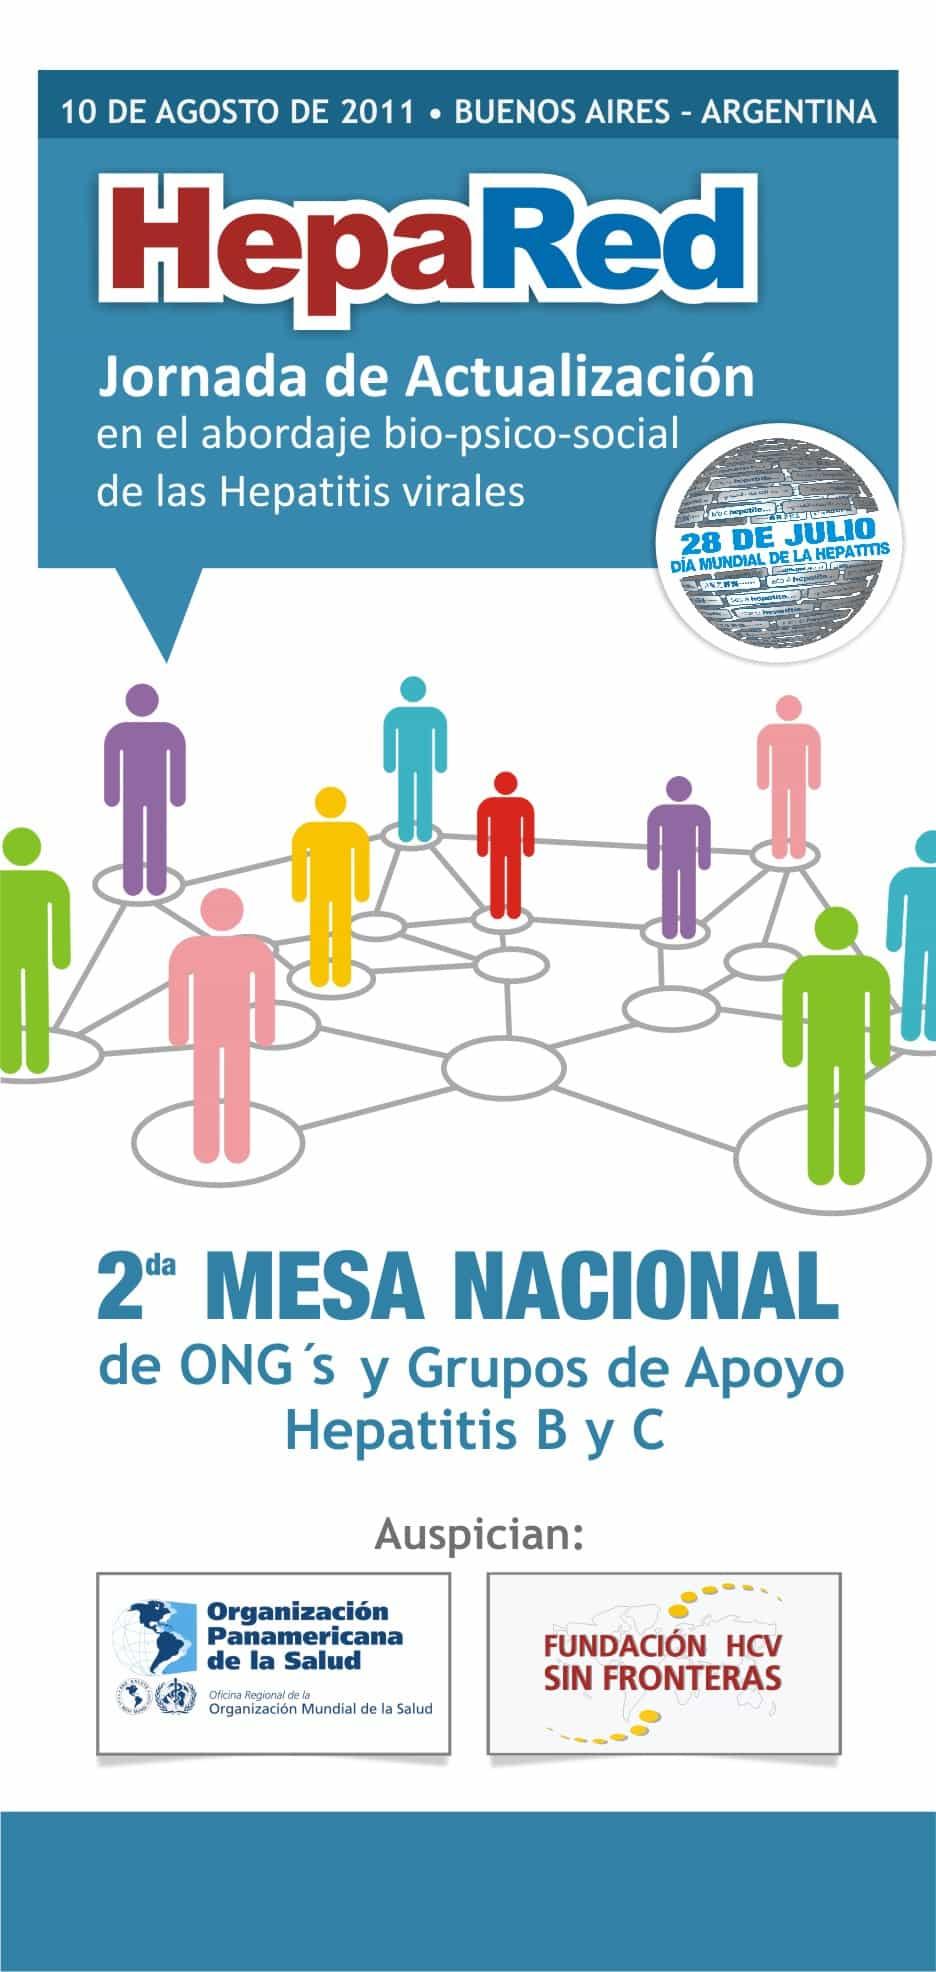 Consenso de ONG´s de pacientes sobre situación de las Hepatitis Virales en Argentina